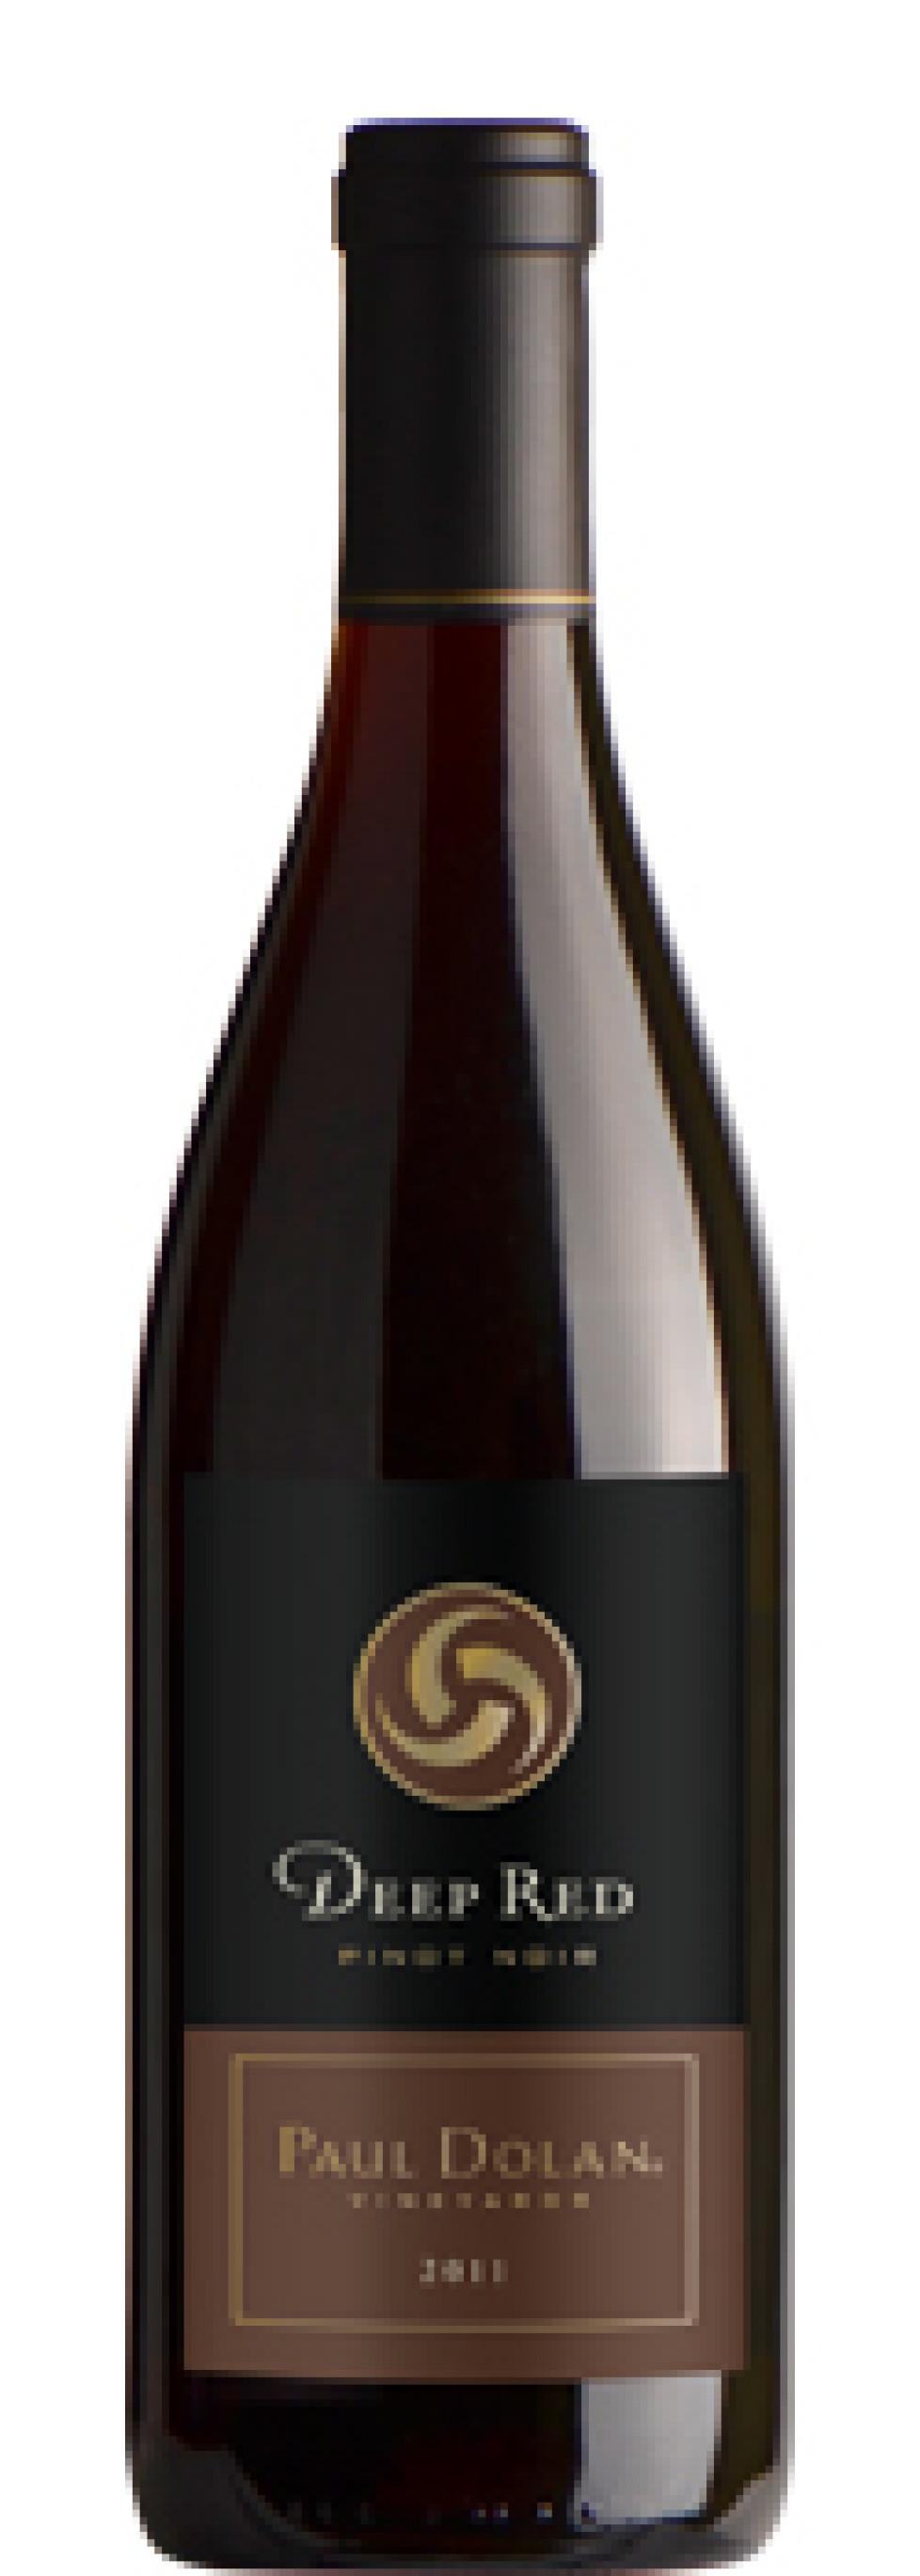 paul-dolan-vineyards-deep-red-pinot-noir-2011